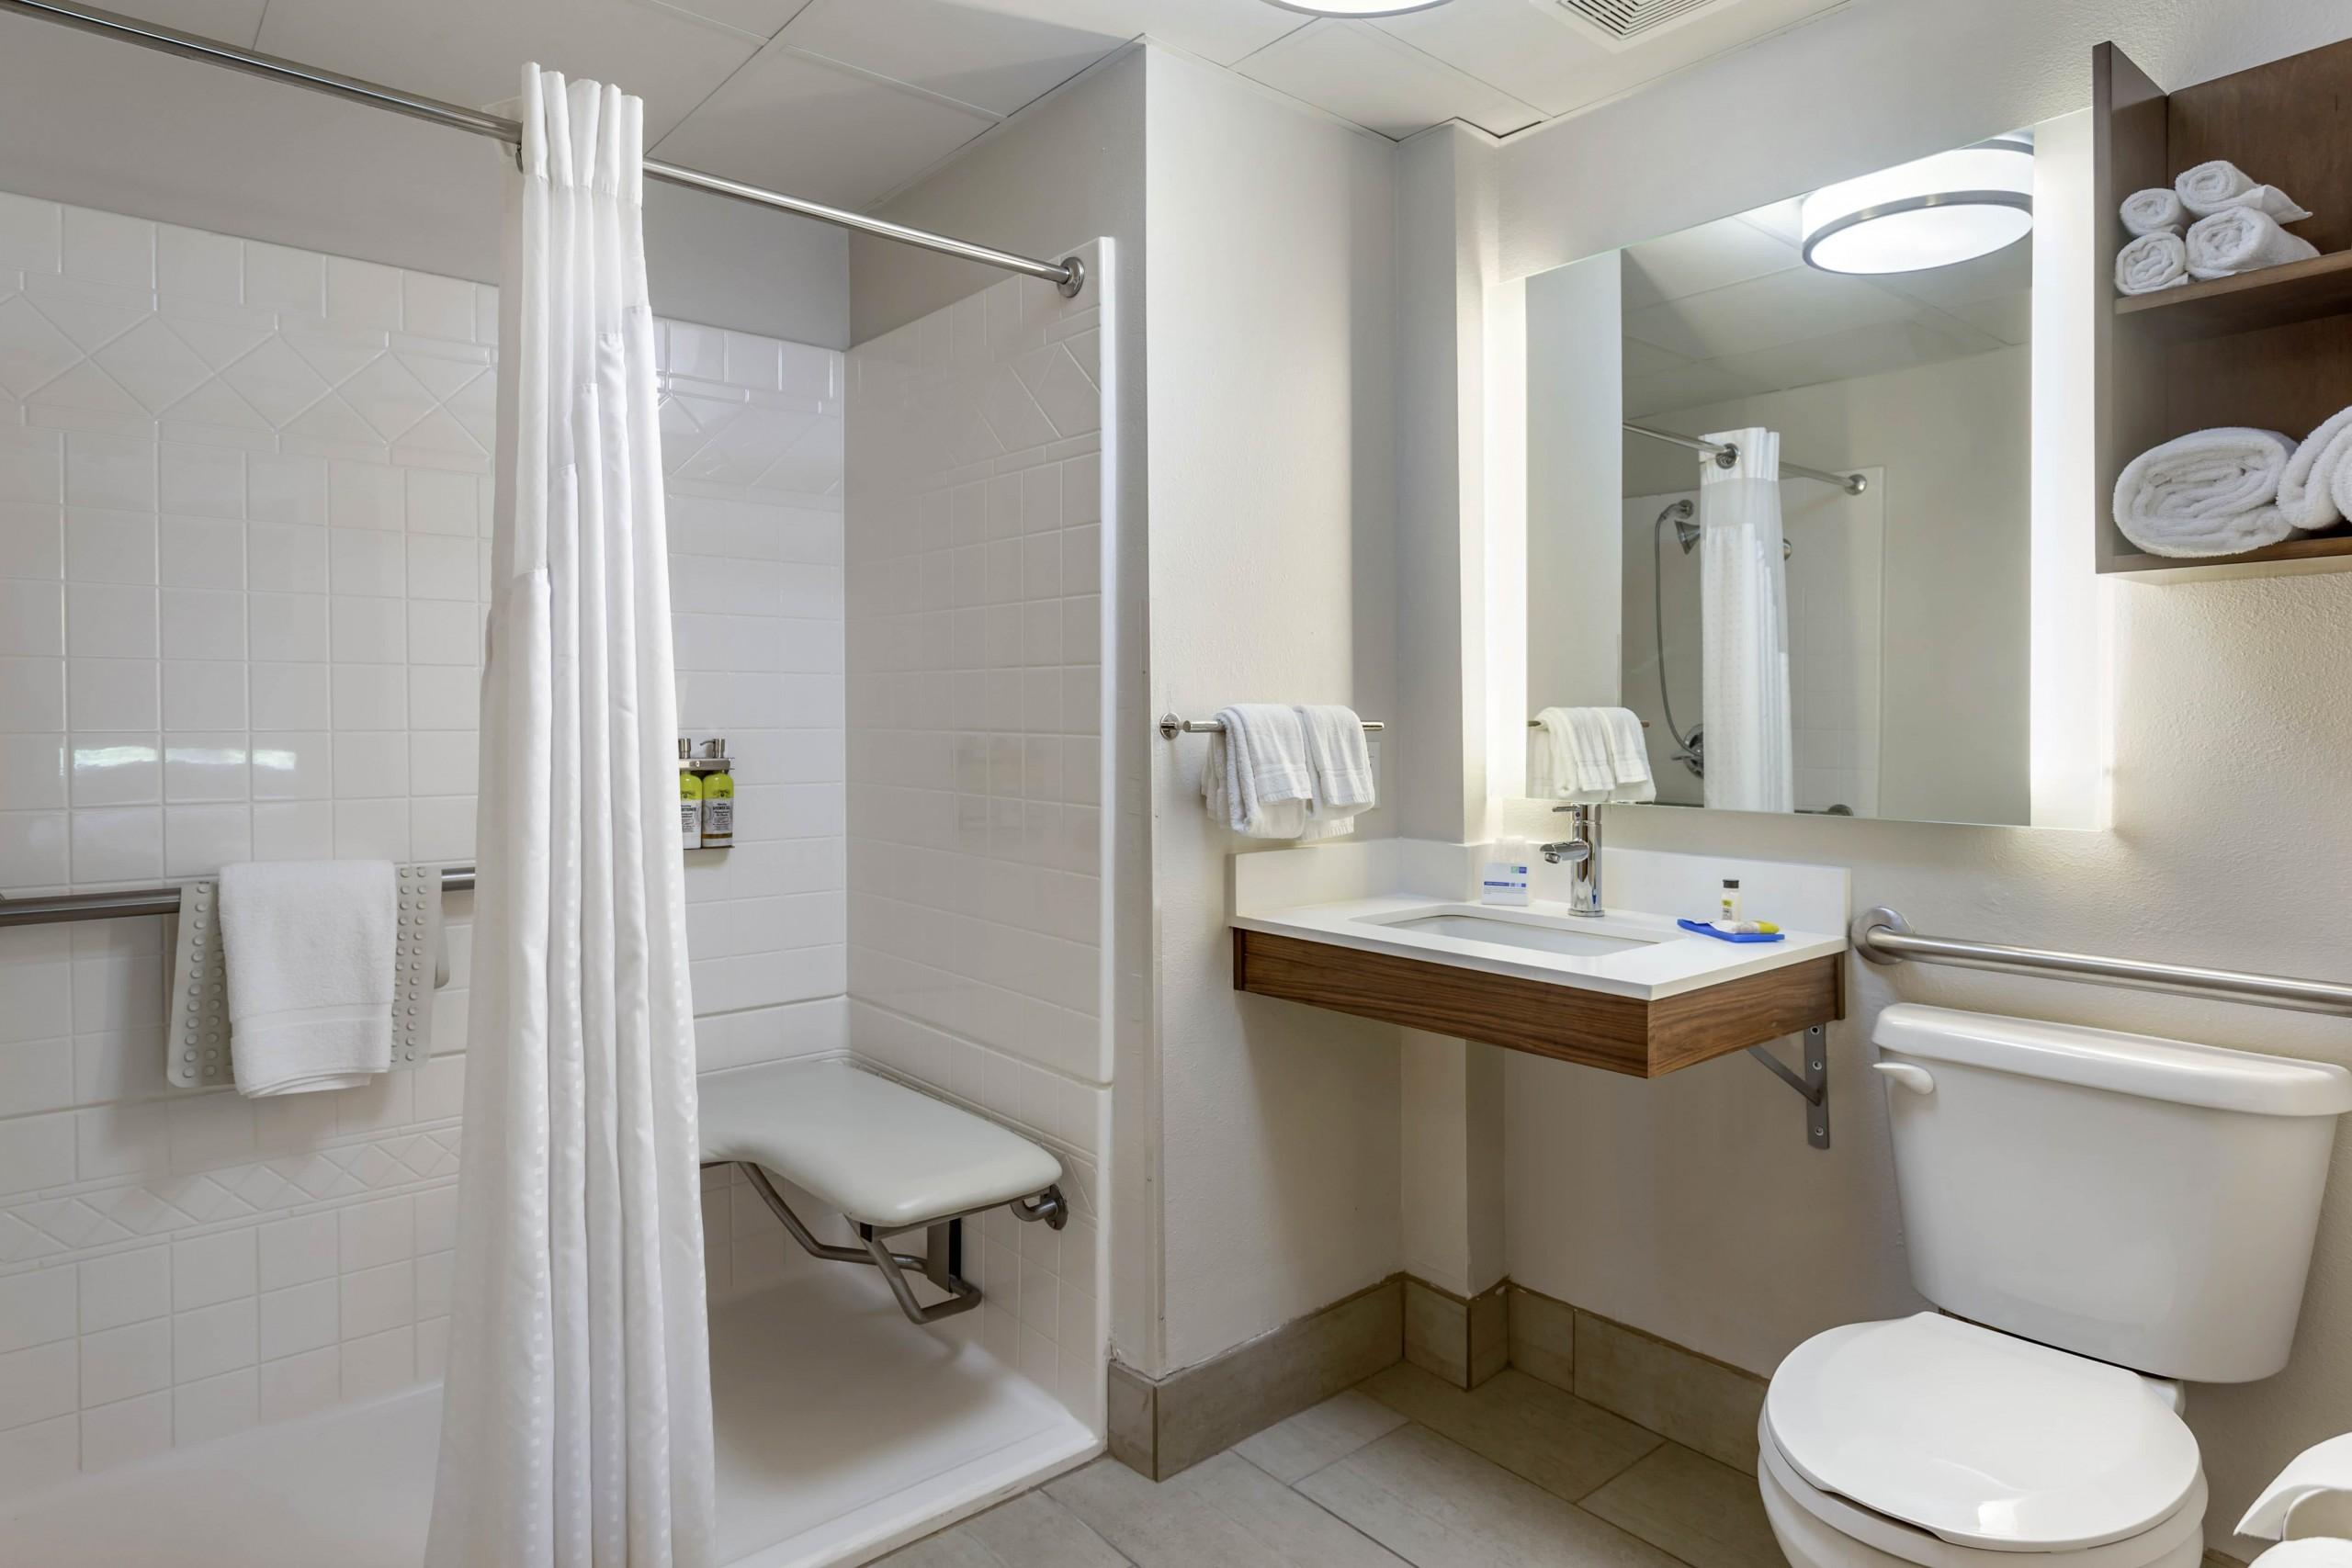 Holiday Inn Express Accessible King Bathroom